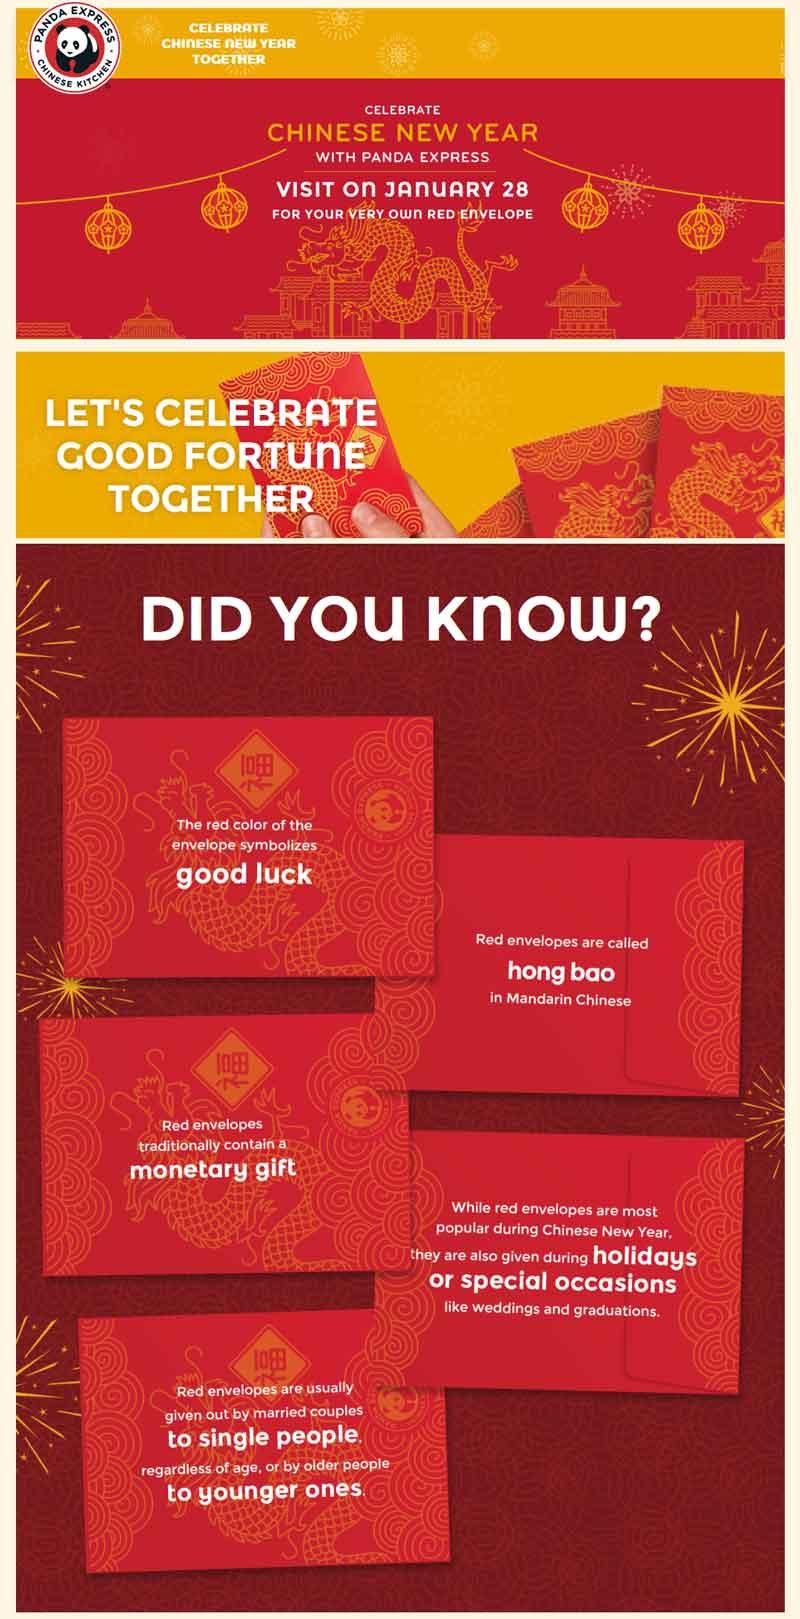 Panda Express Coupon October 2018 Red envelope giveaways Saturday at Panda Express restaurants